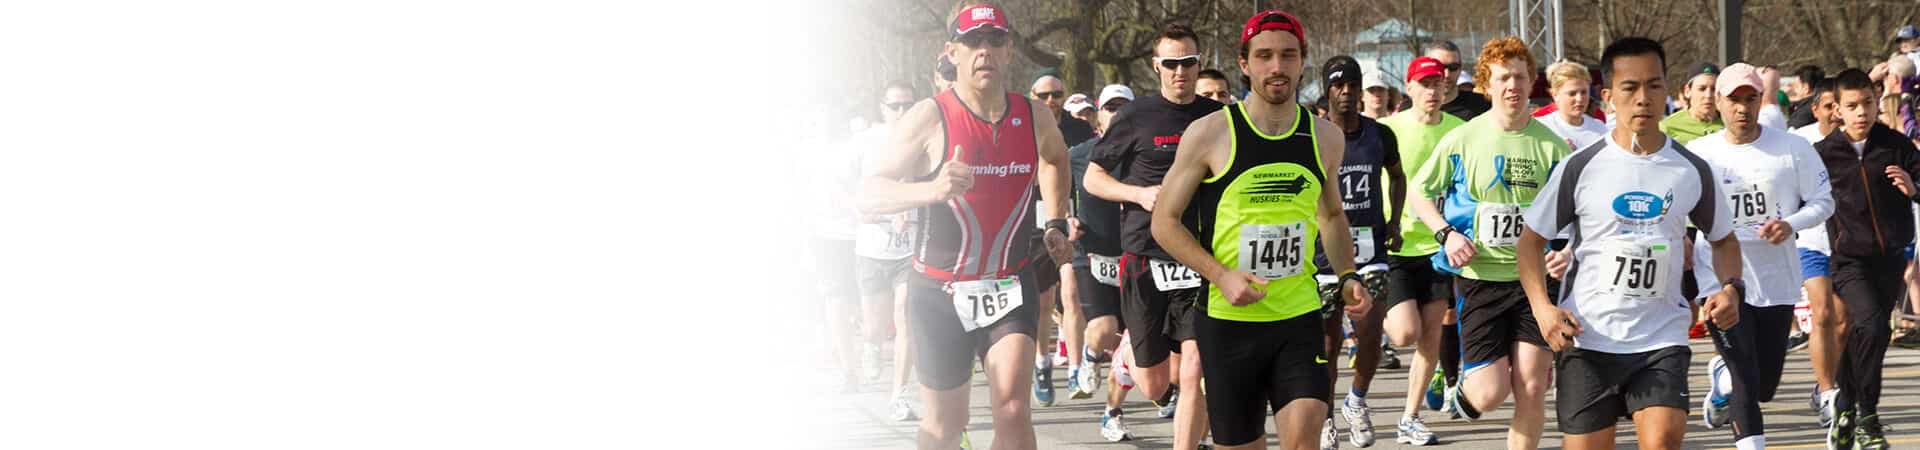 Run-for-Southlake-Homepage-Banner